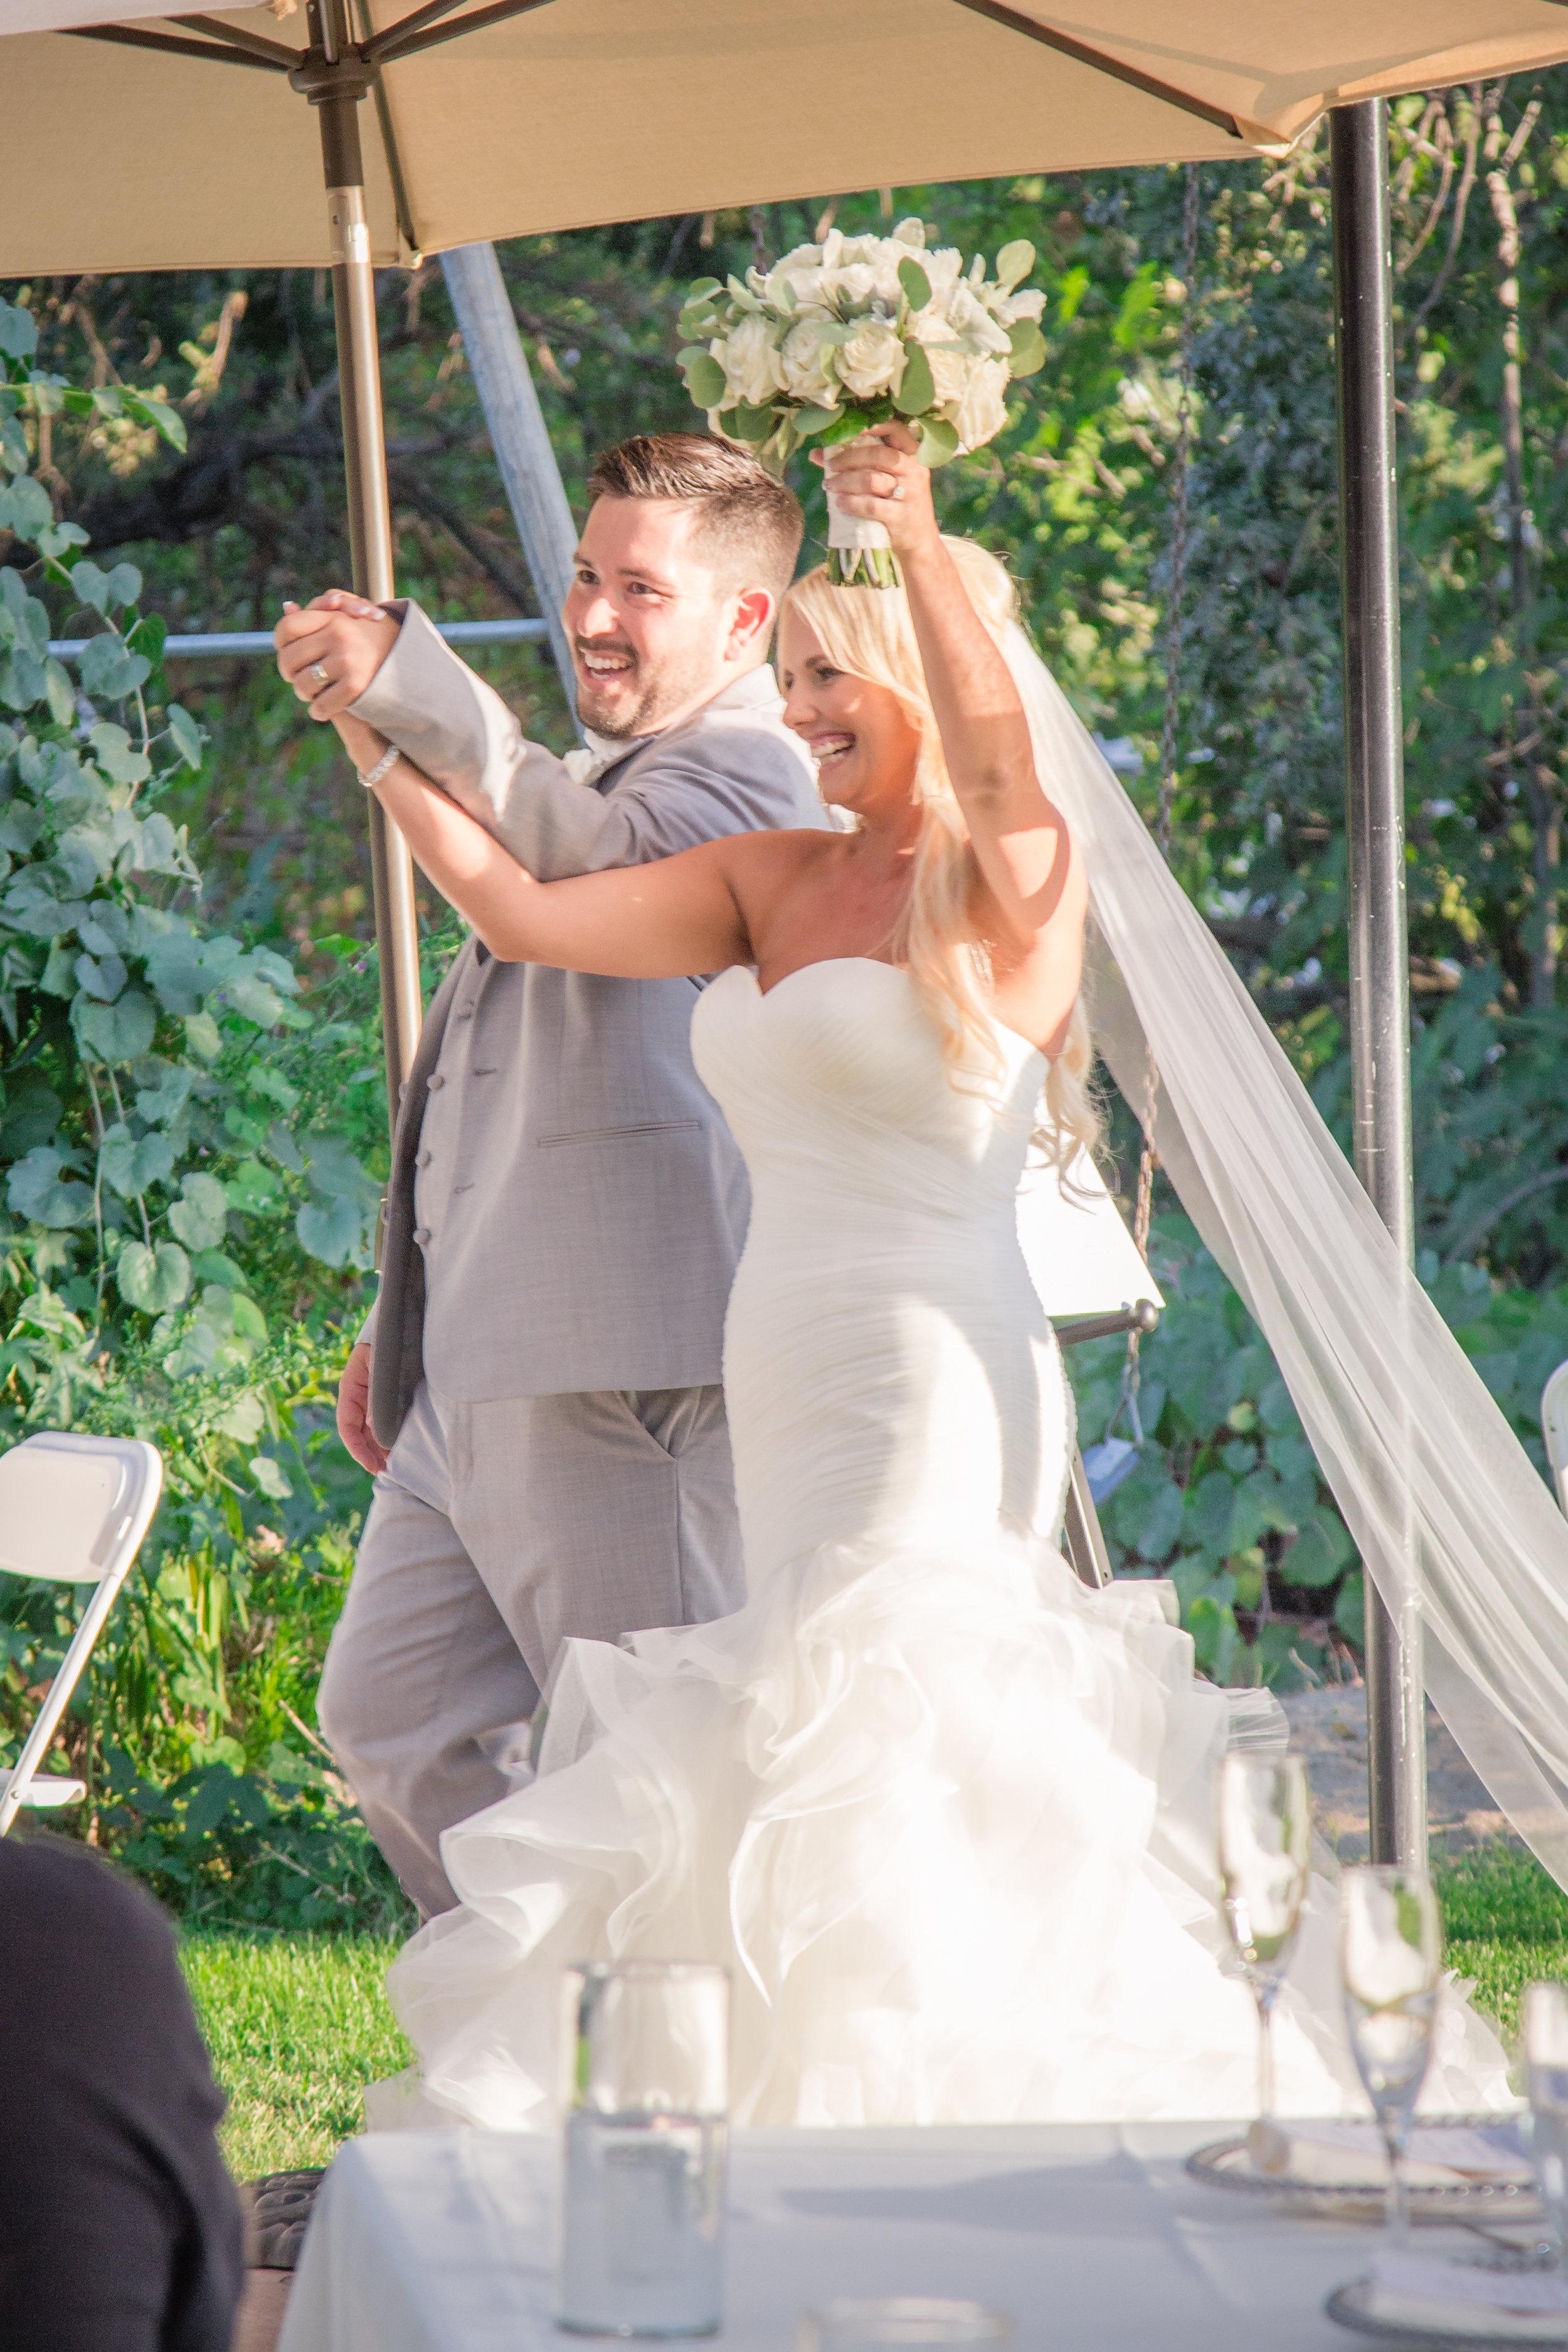 White Ranch Events - Chico - Ashley Teasley Photography - Sacramento Wedding Photographer26.JPG